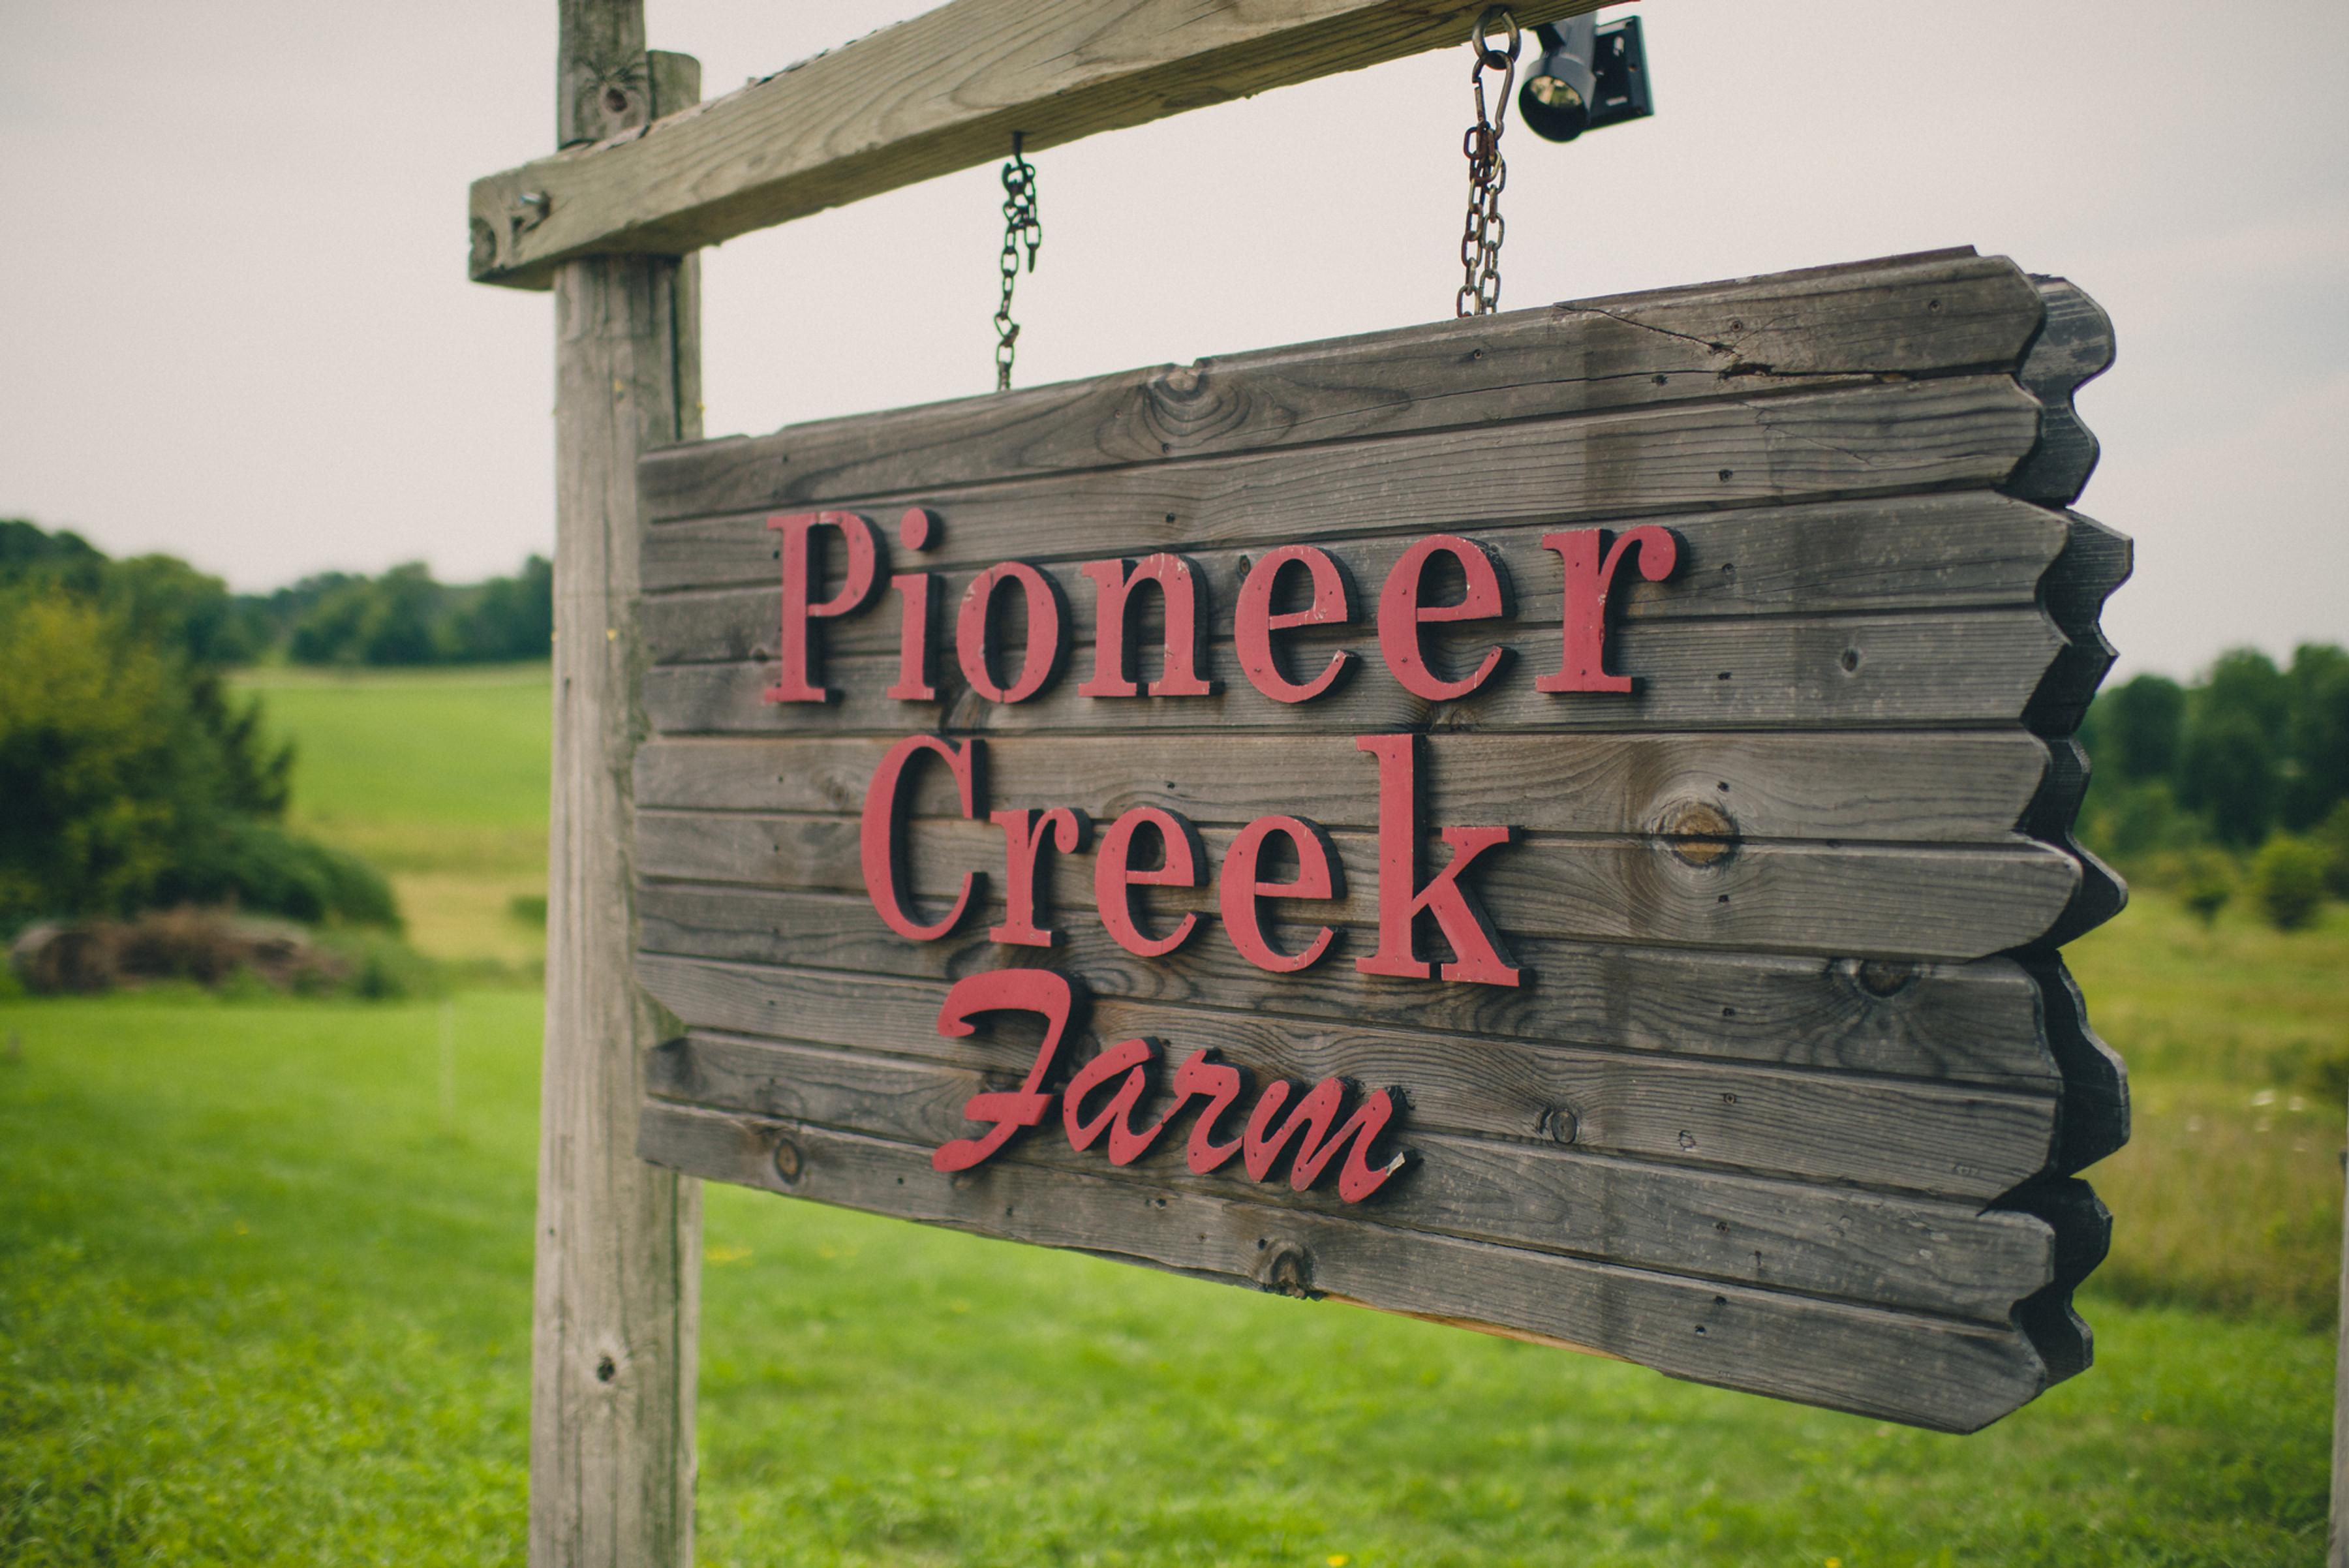 Tour of Pioneer Creek Farm